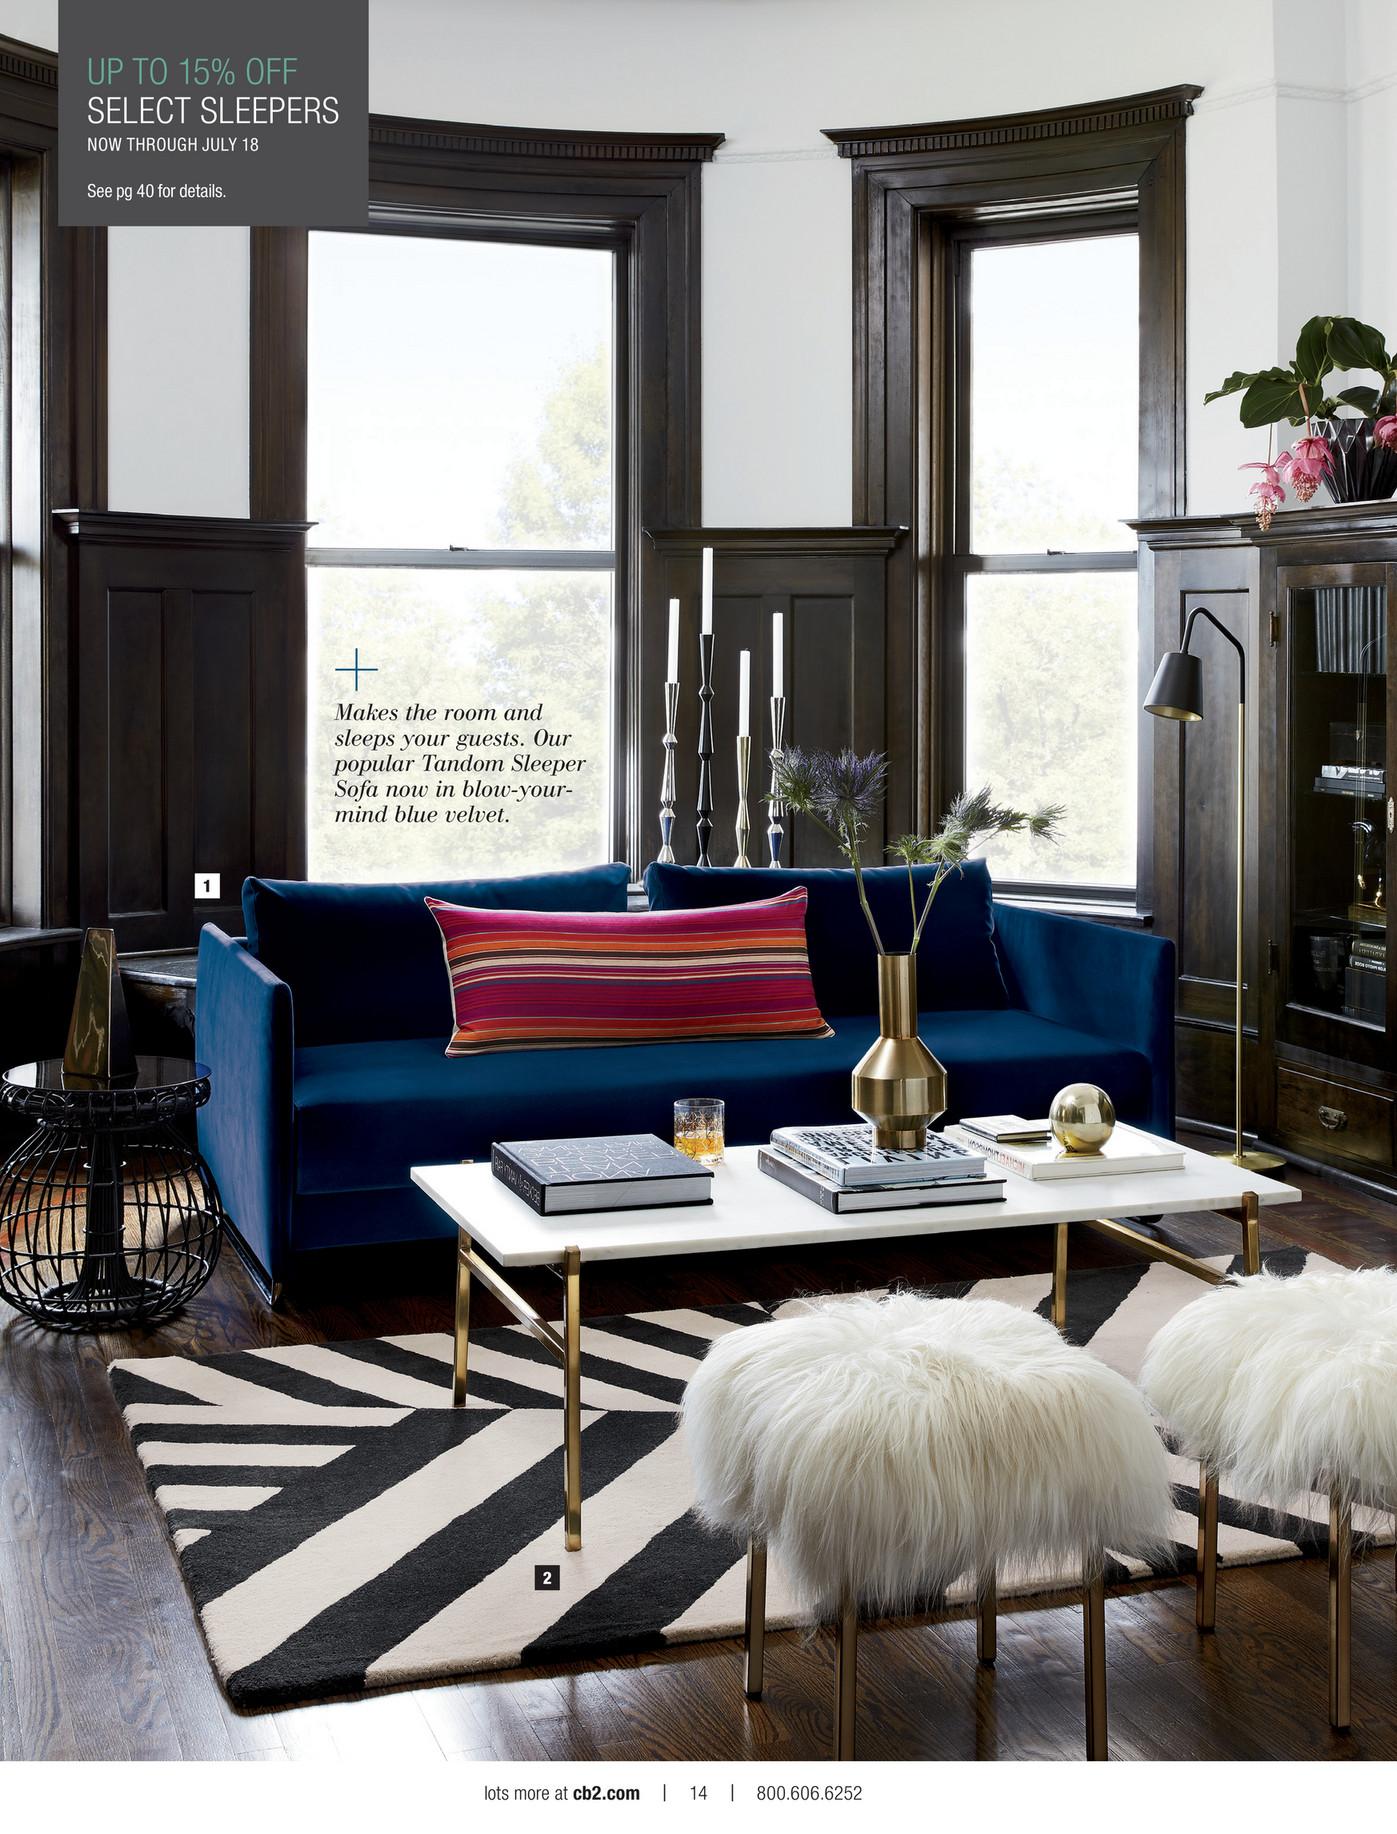 Tandem Sleeper Sofa Ftempo Inspiration